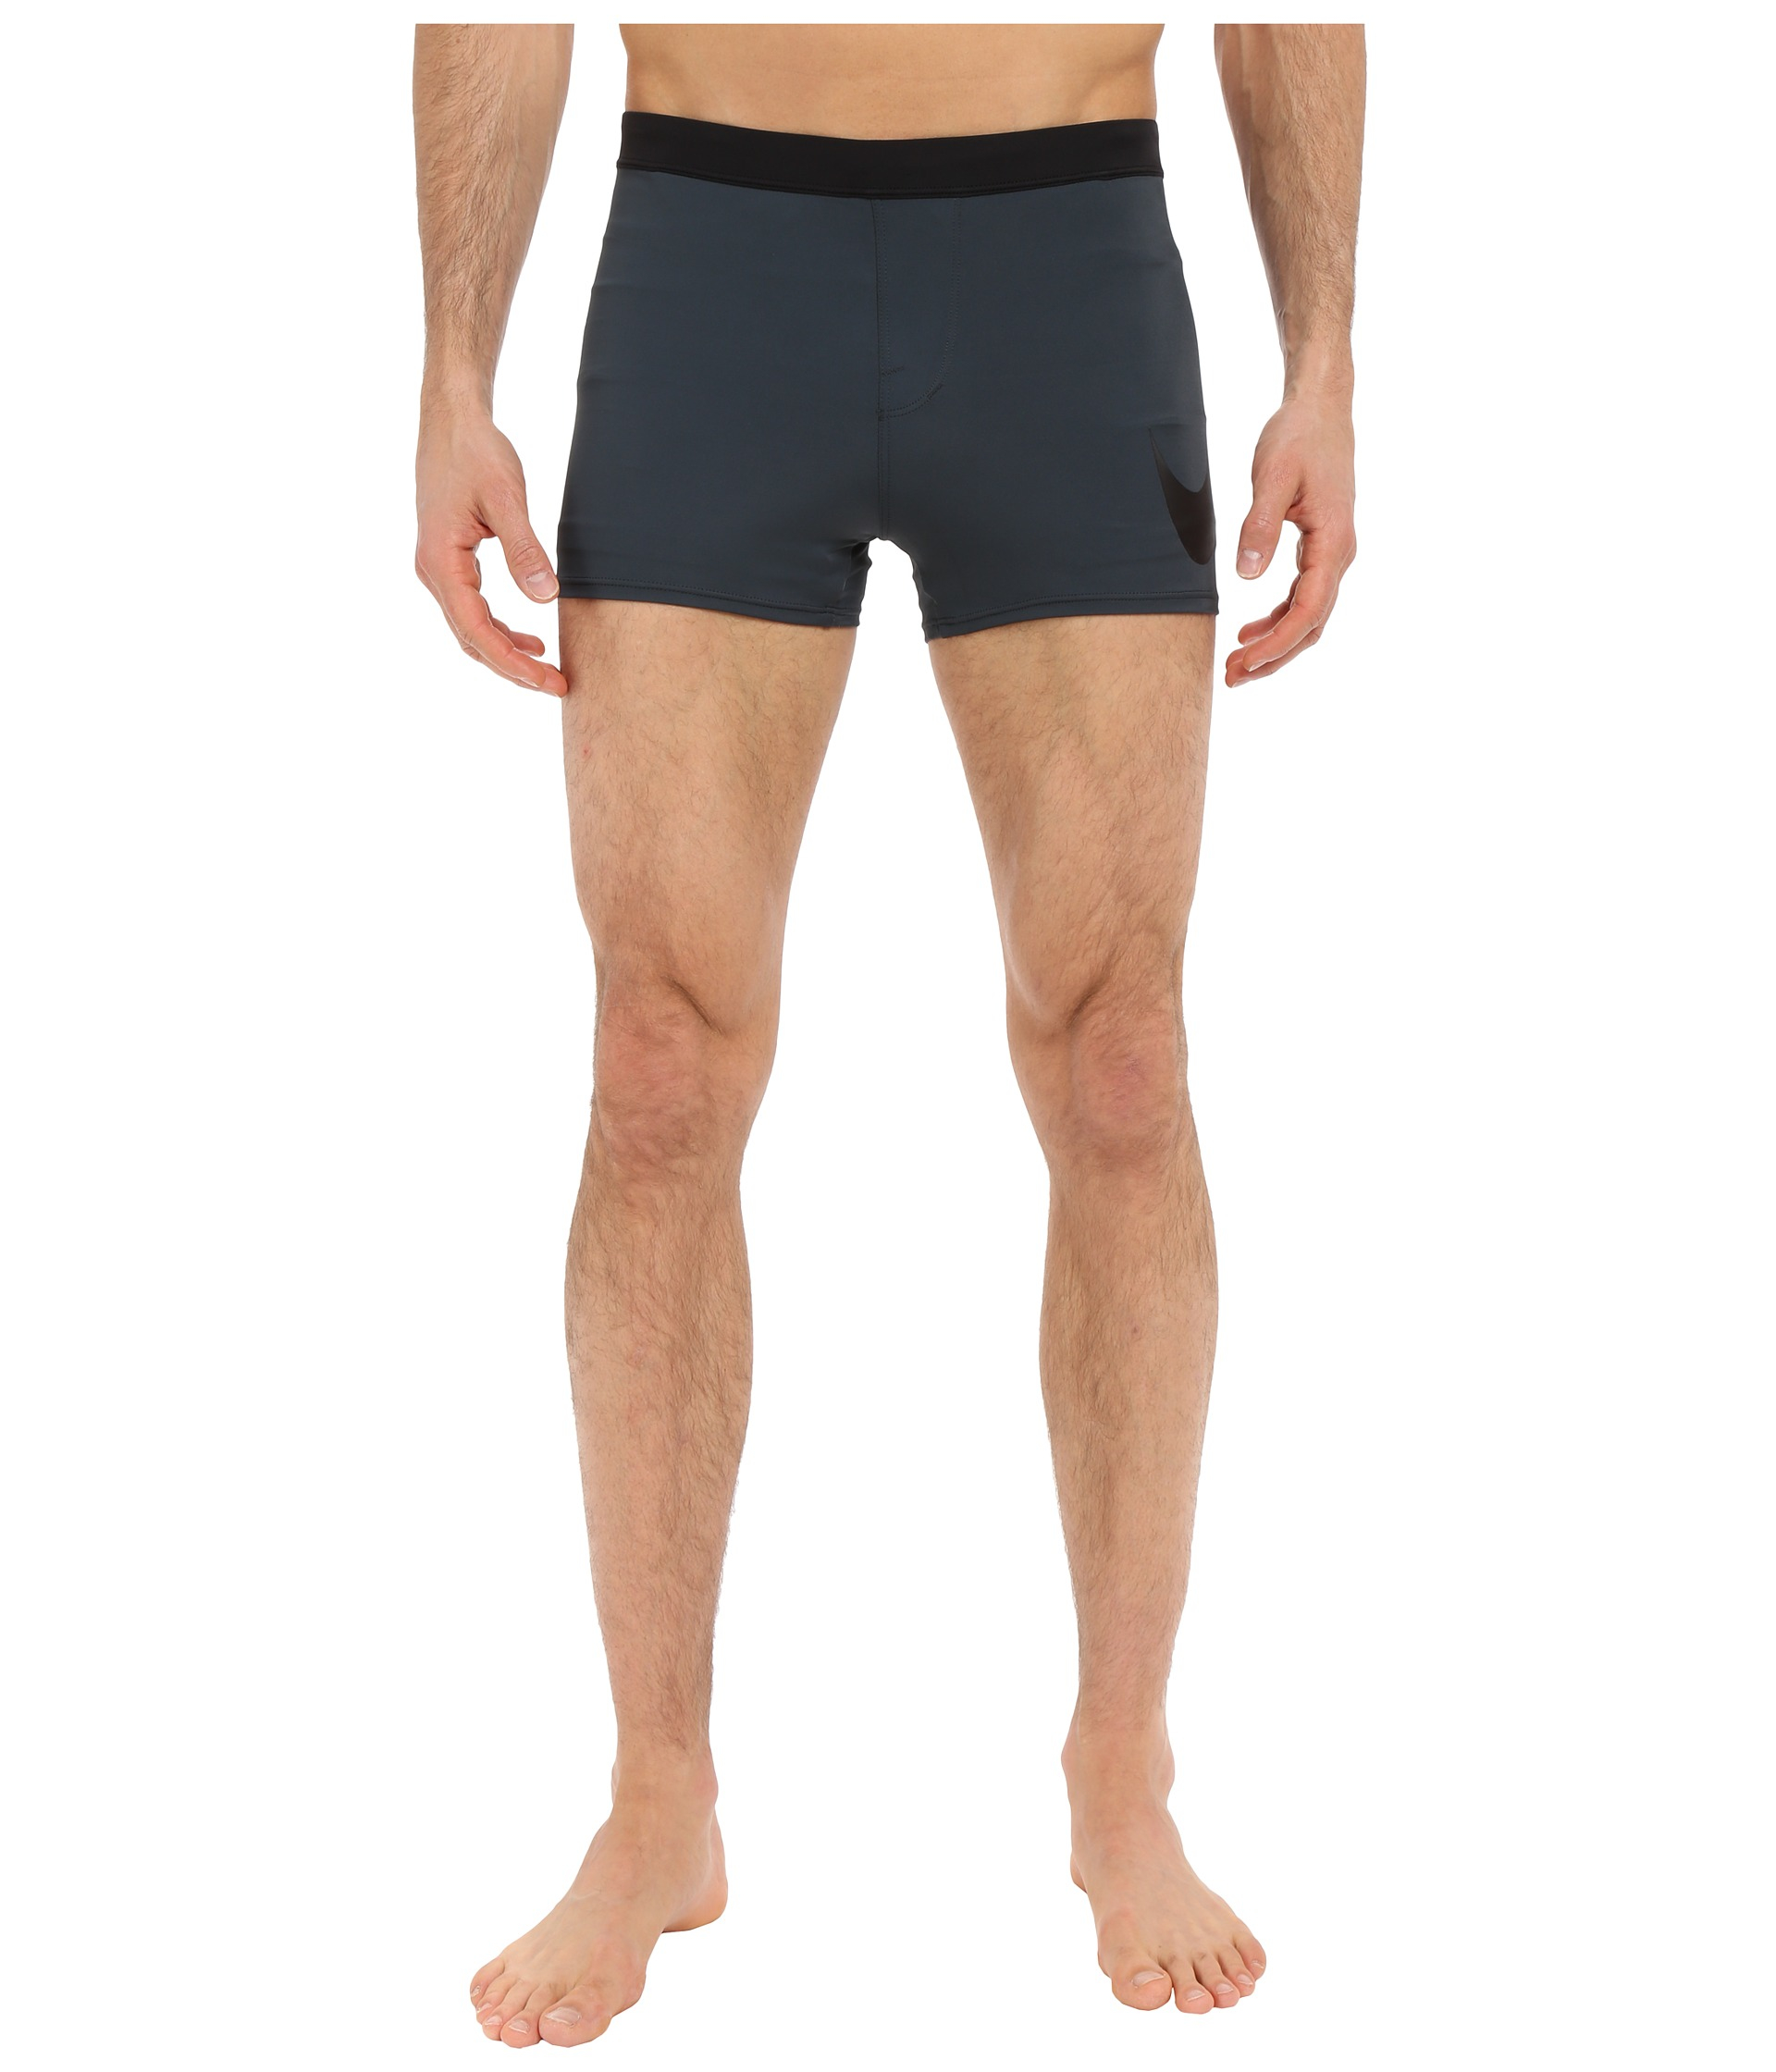 460155bbf9 Nike Metro Big Swoosh Square Leg Swim Trunk in Gray for Men - Lyst